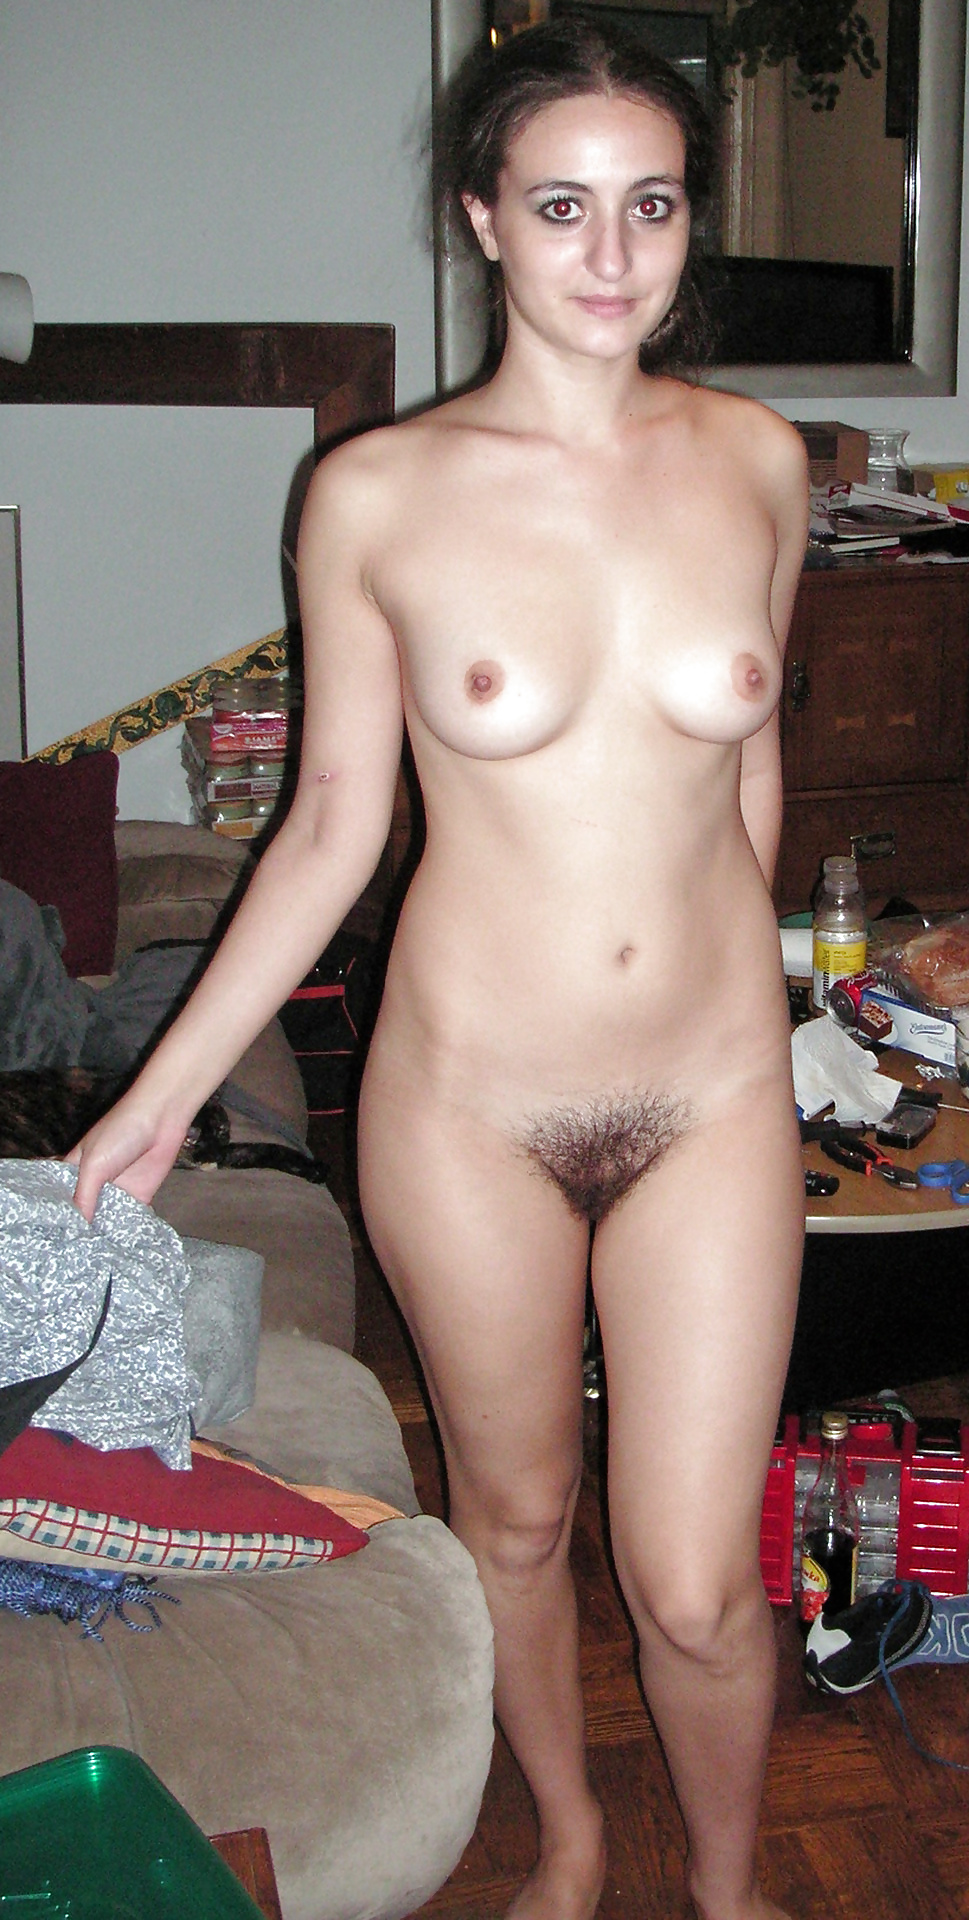 Teen ex girlfriend hairy nude photo #9